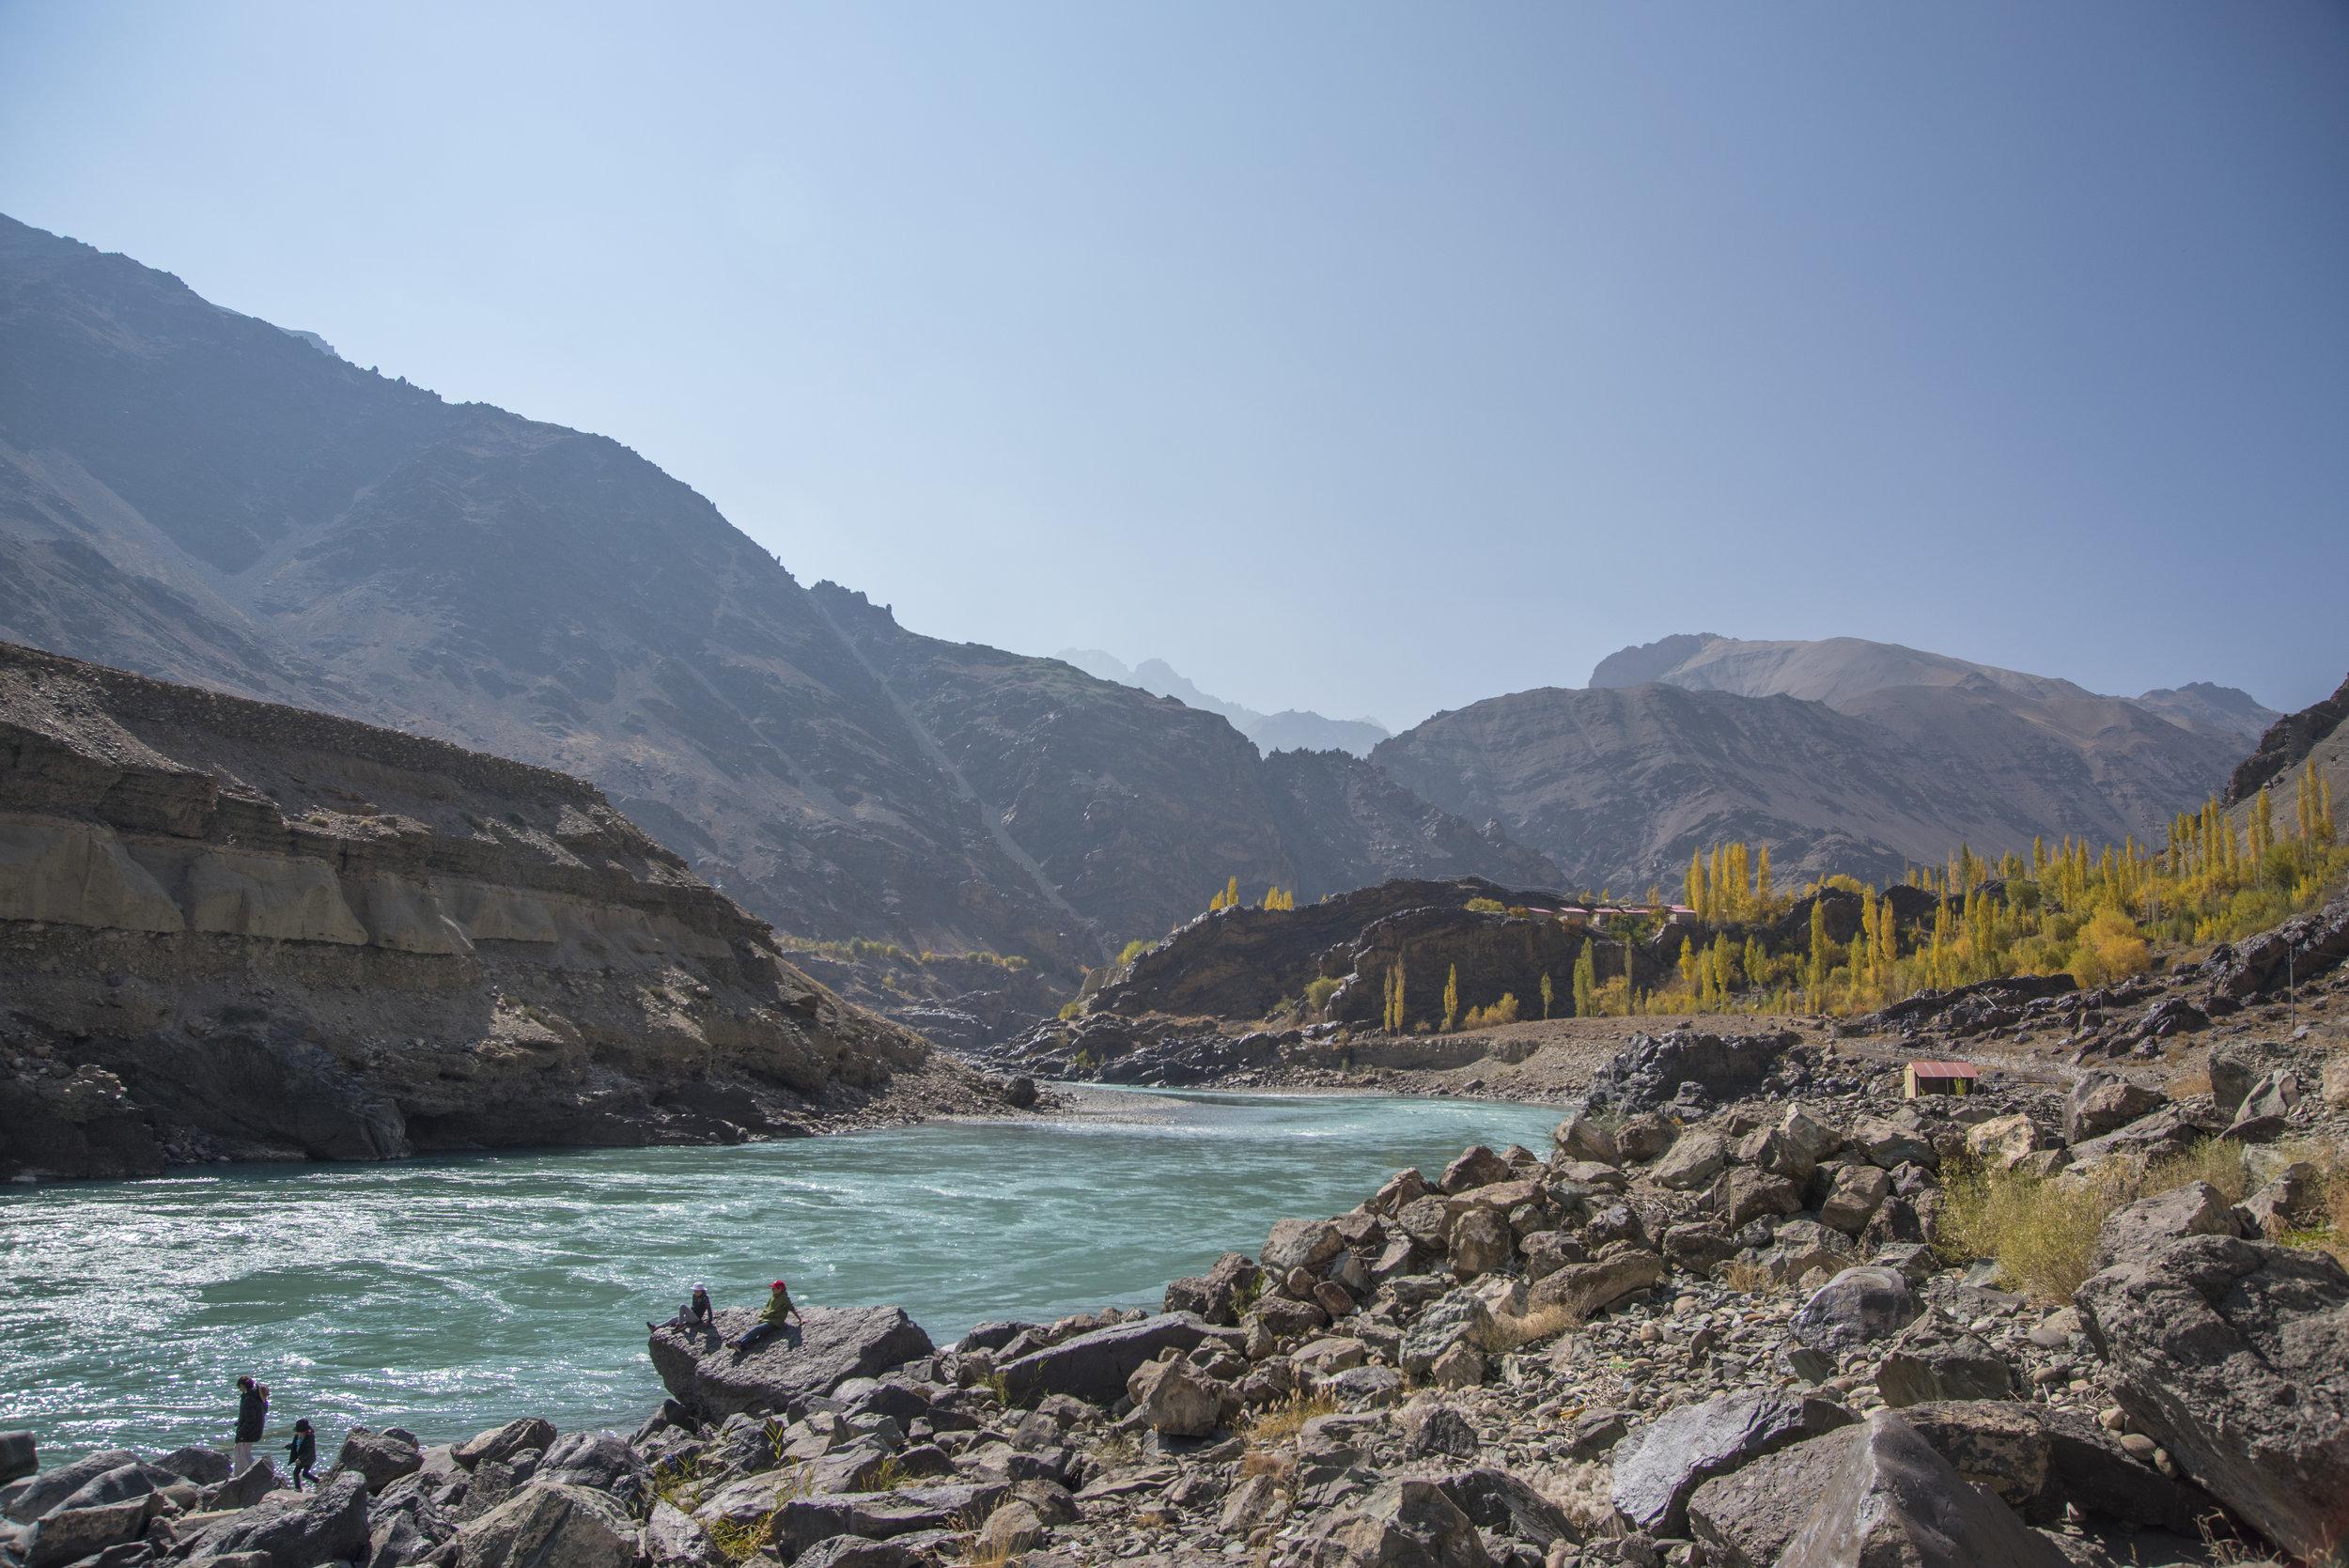 Munchkins beside the Indus. (Saspol, India; Oct 2017)